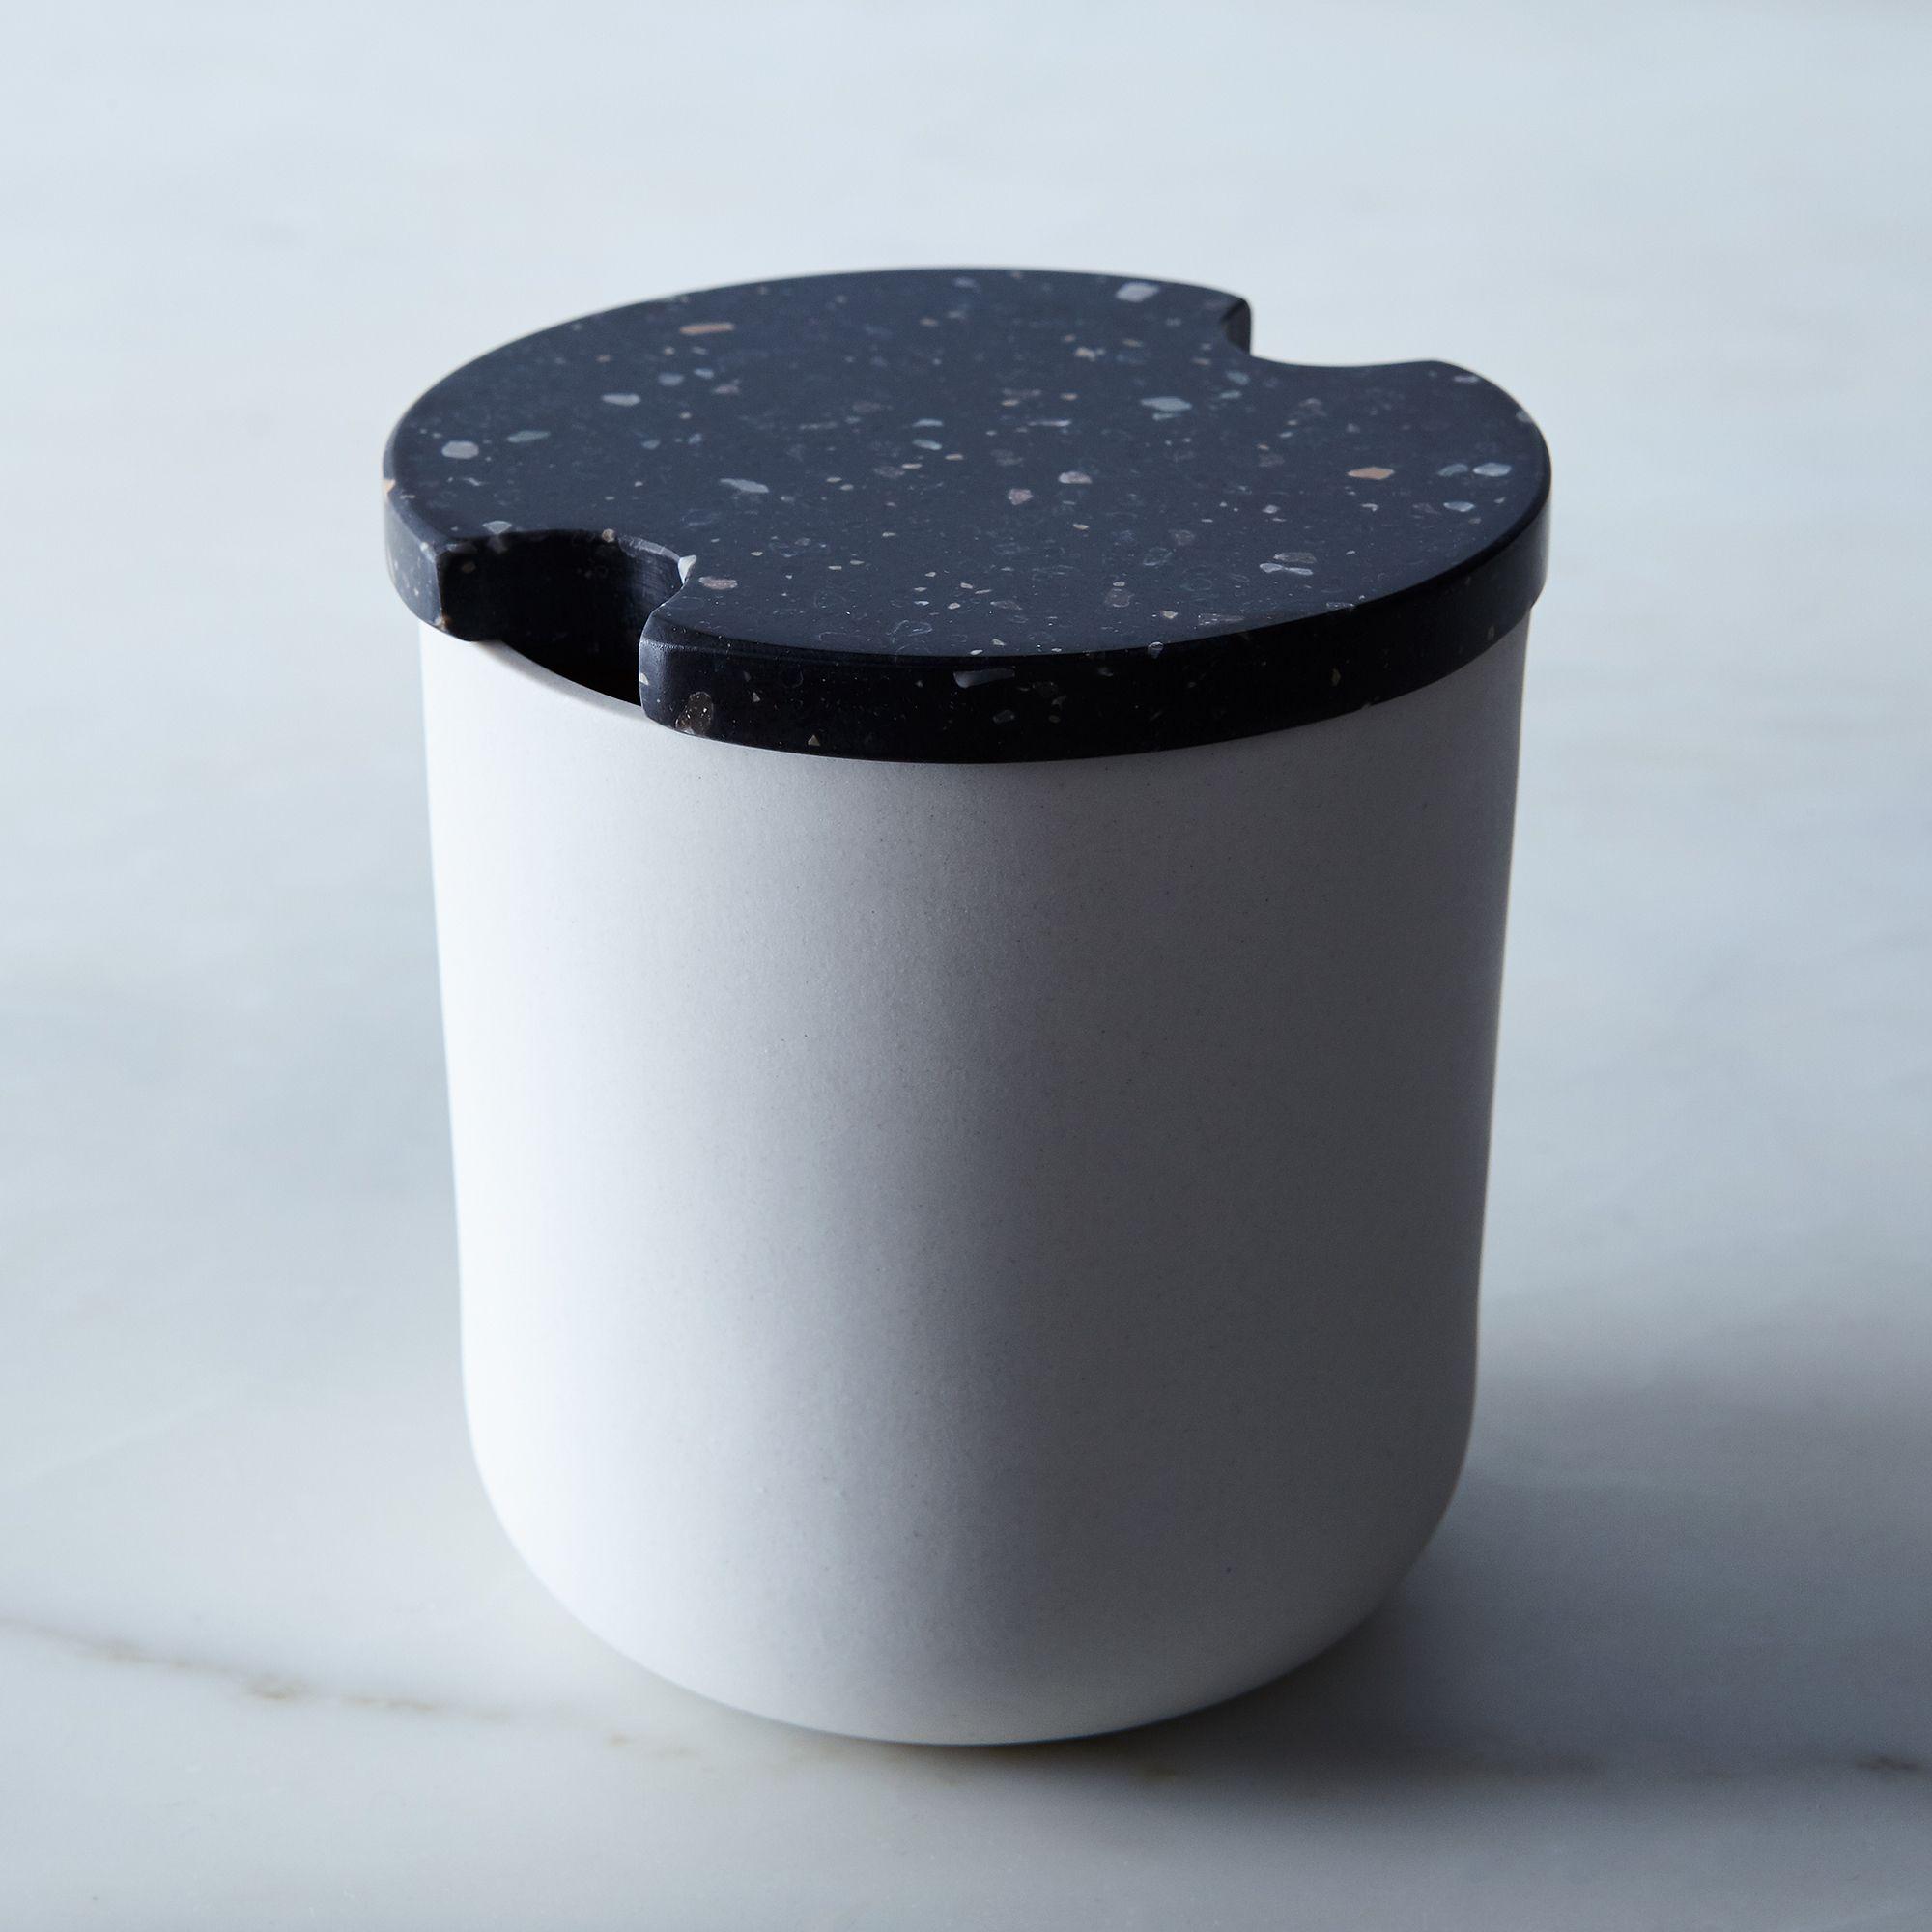 C2b2932a 6acd 4e9b aee6 01ca7488d42d  2017 0321 jarre black corian stoneware garlic jar silo rocky luten 0650